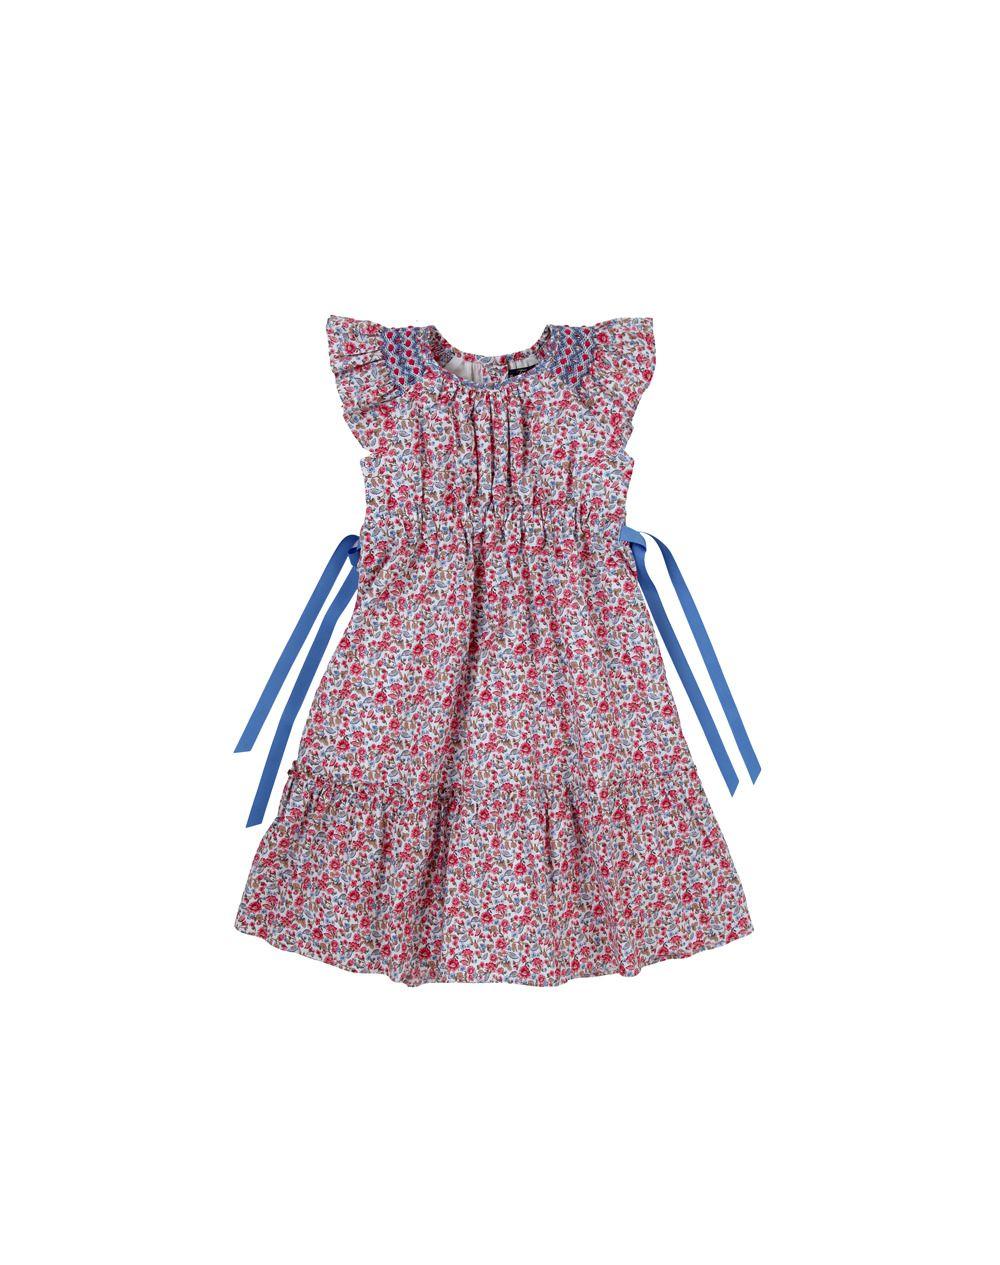 7a018974634b Vestido de niña Tizzas - Niña - Vestidos - El Corte Inglés - Moda ...